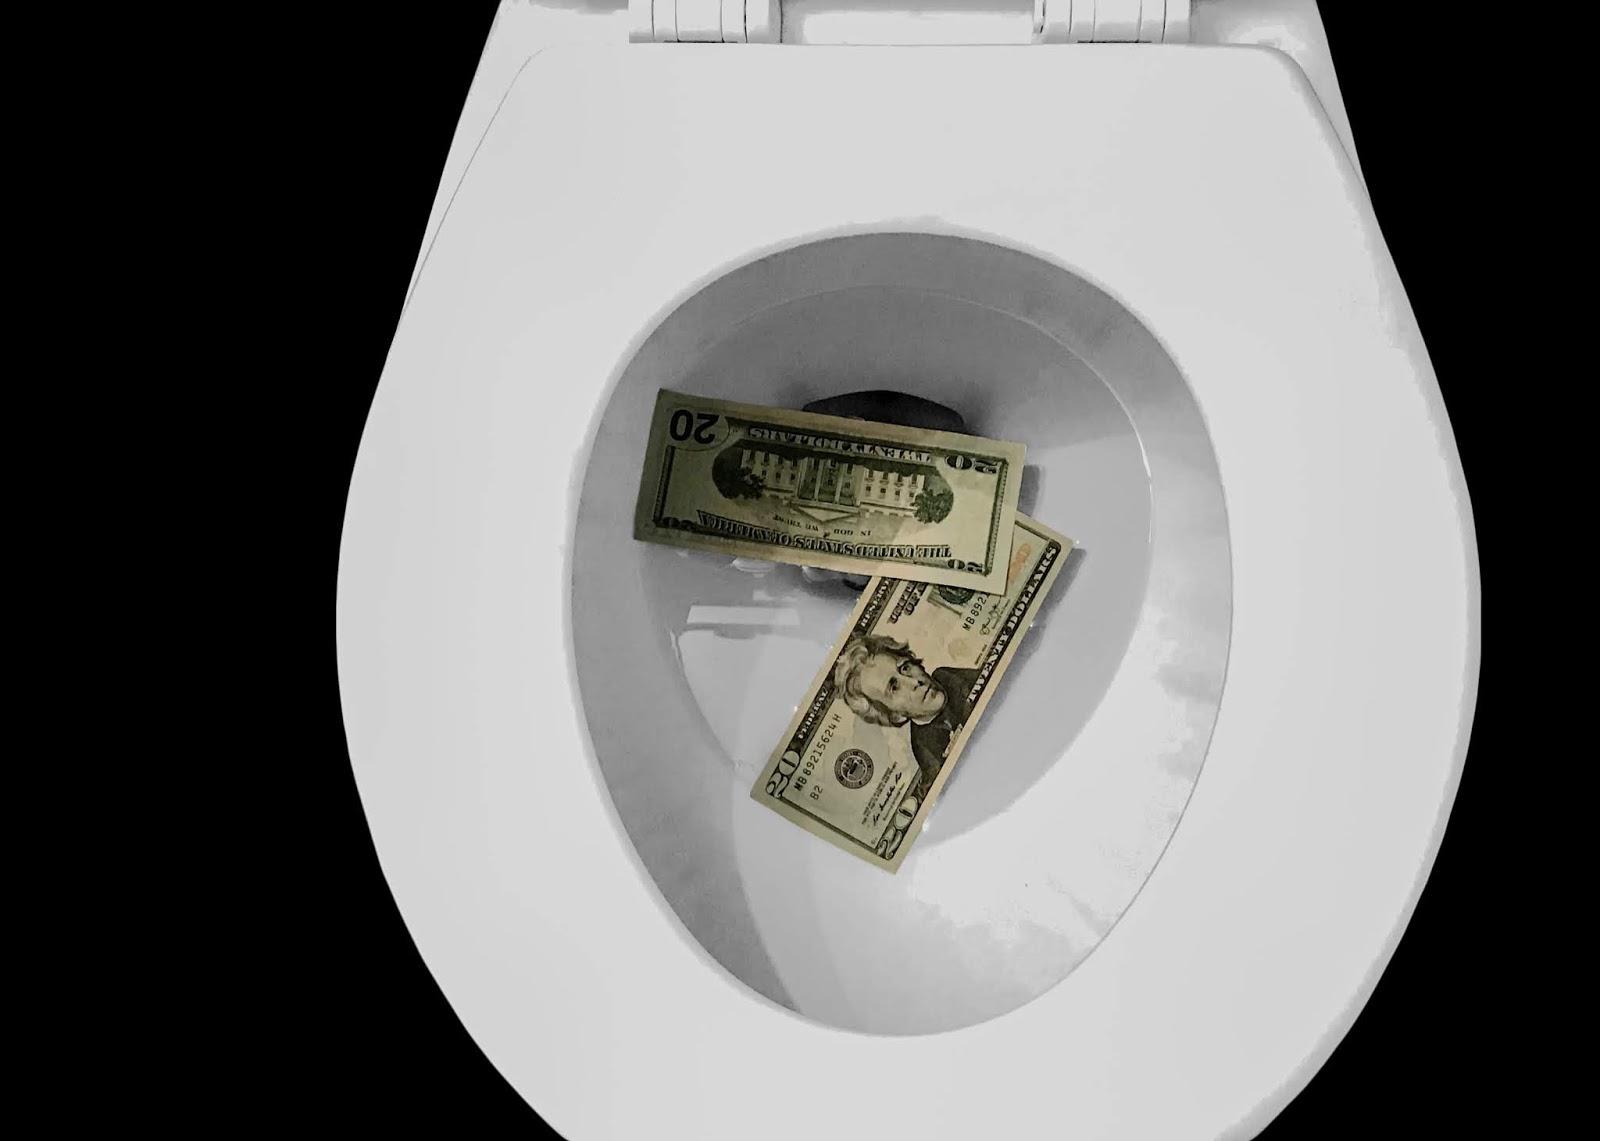 stop flushing money down the toilet